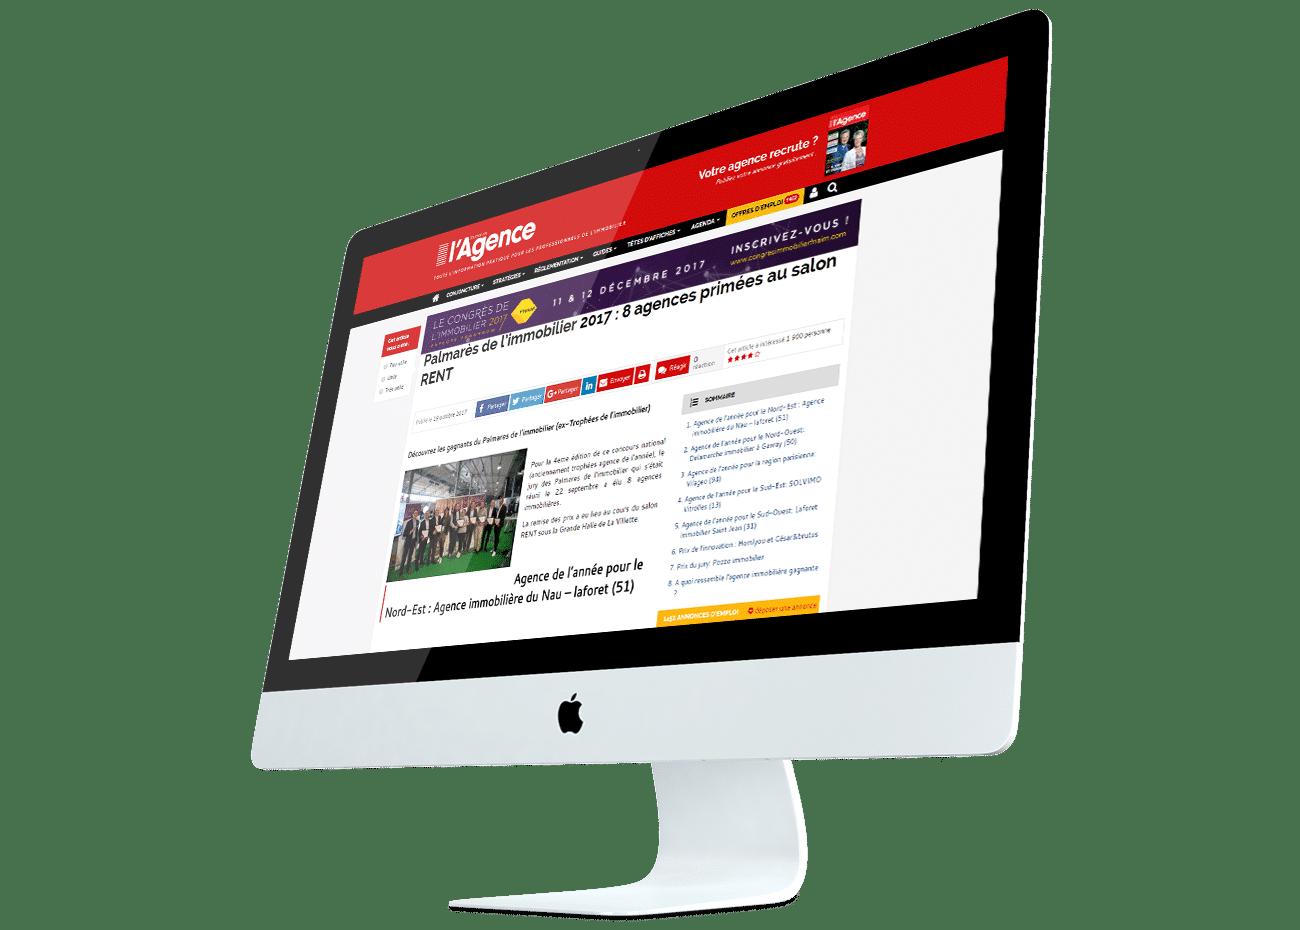 presse journal de lagence article palmares immobilier vitrinemedia afficheur lumineux vitrine eclairee